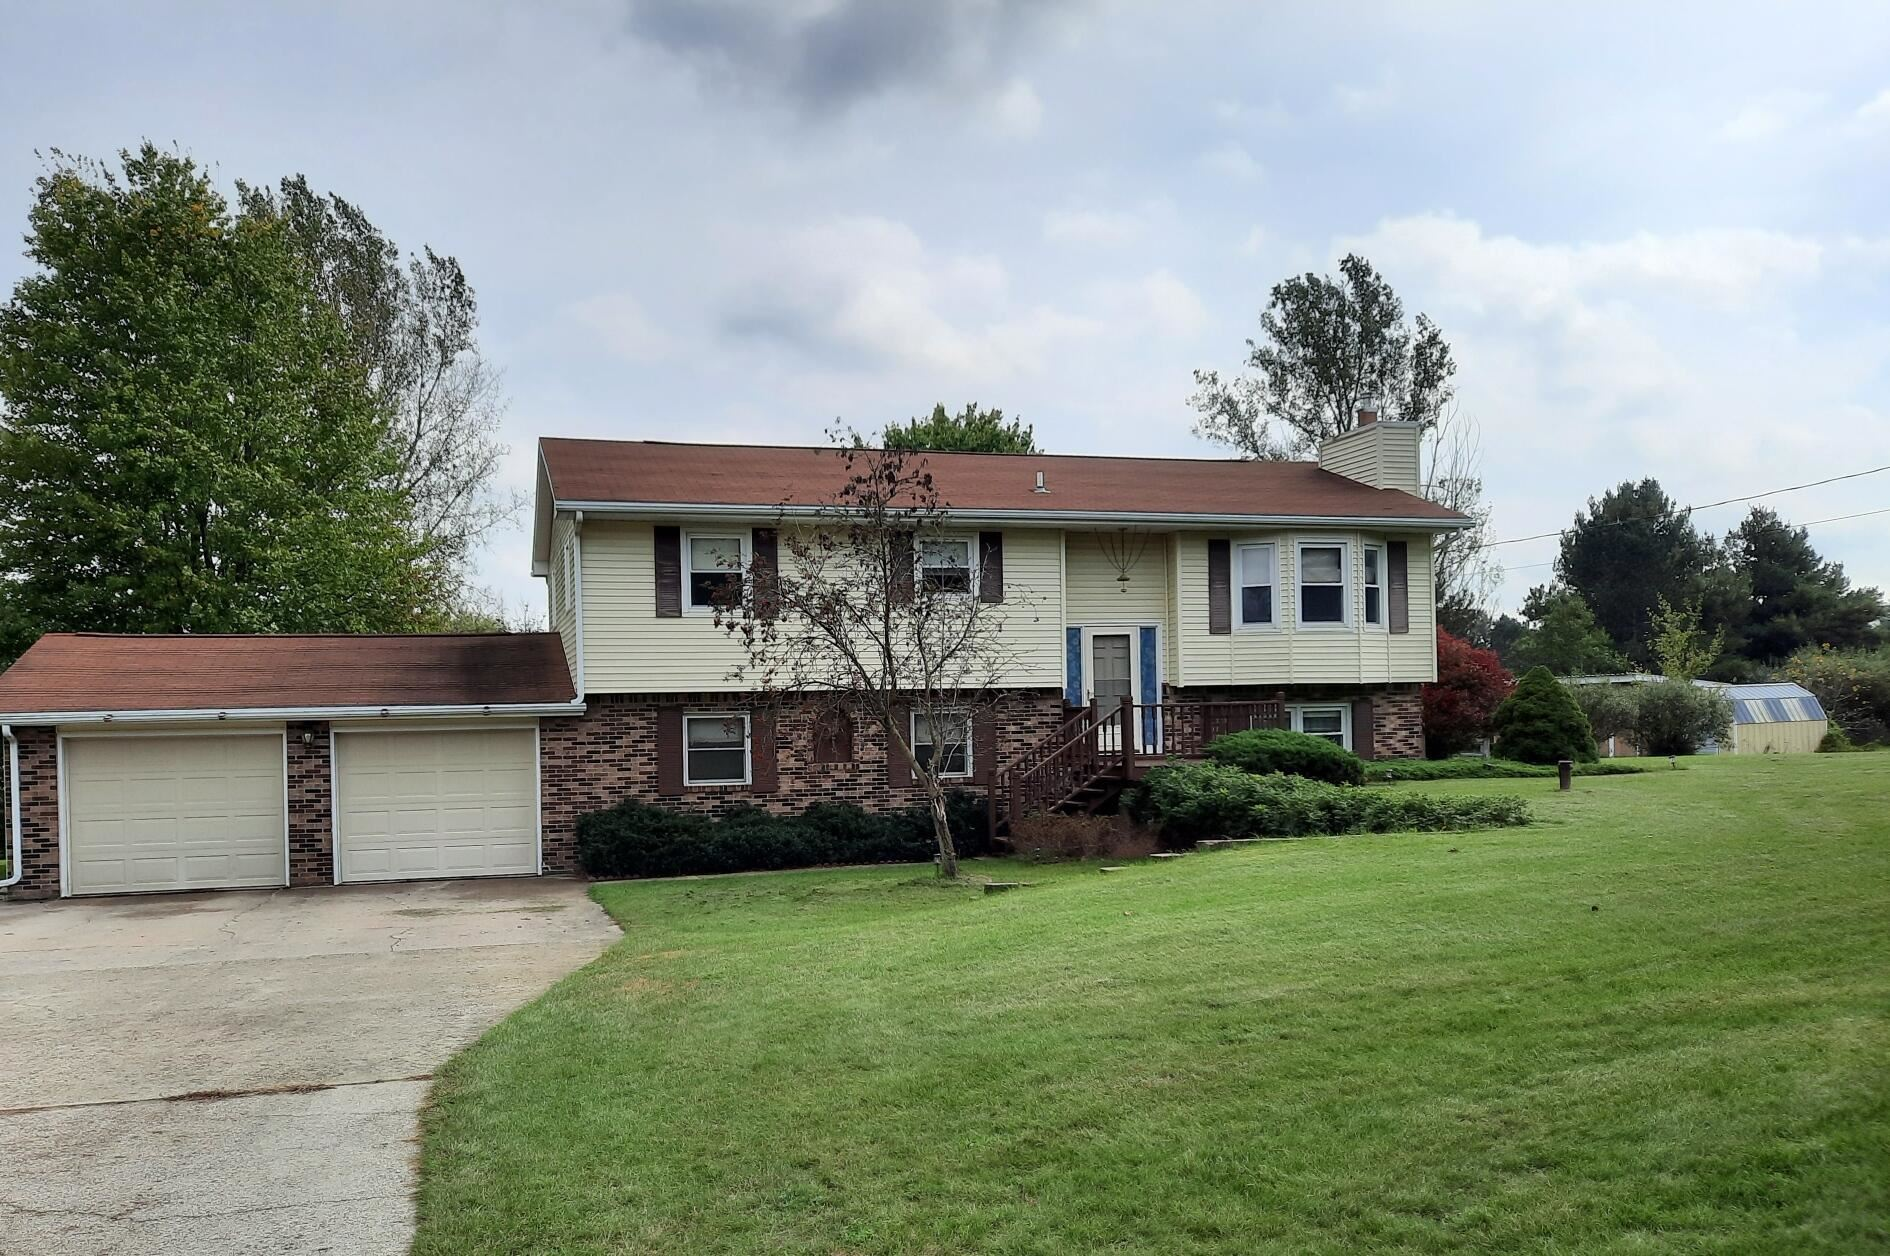 Photo of 11150 Heintzelman Avenue NE, Rockford, MI 49341 (MLS # 21110274)